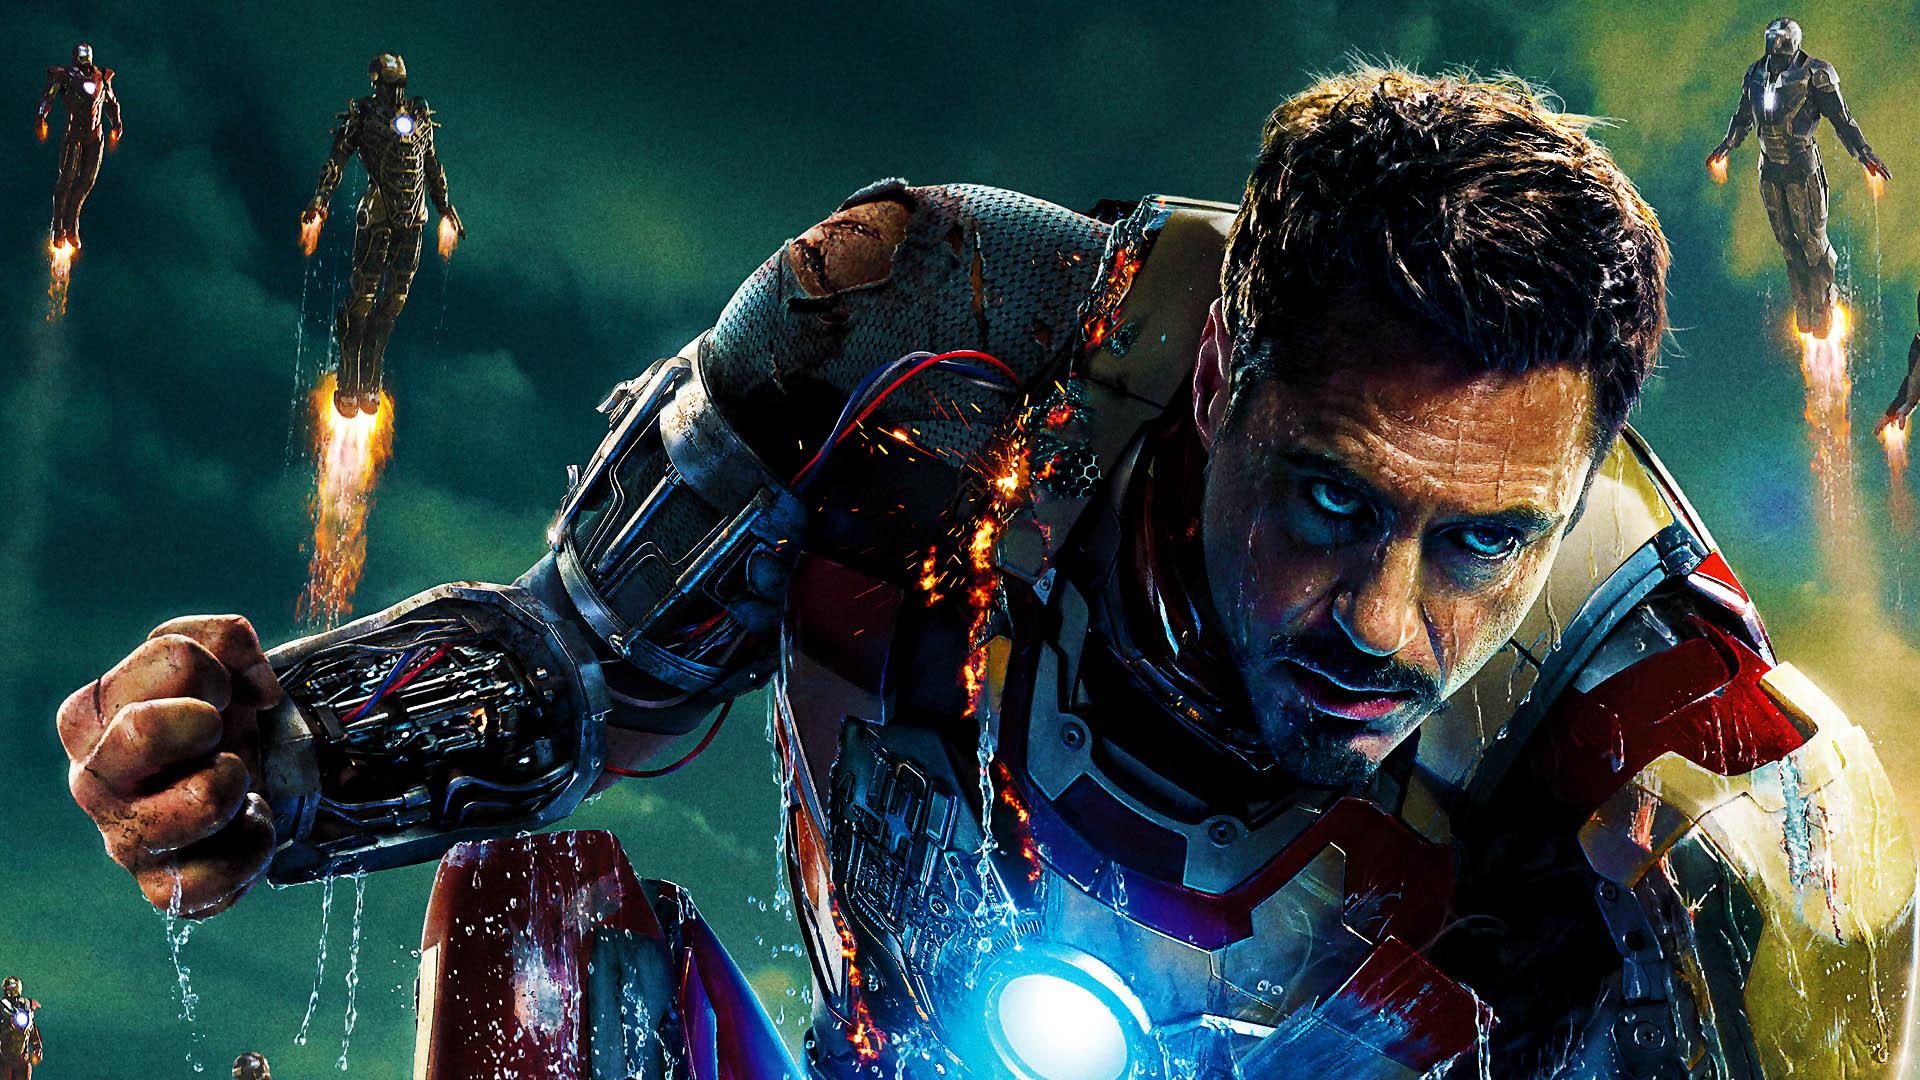 Iron Man 3 Hd Wallpaper Background Image 1920x1080 Id 674300